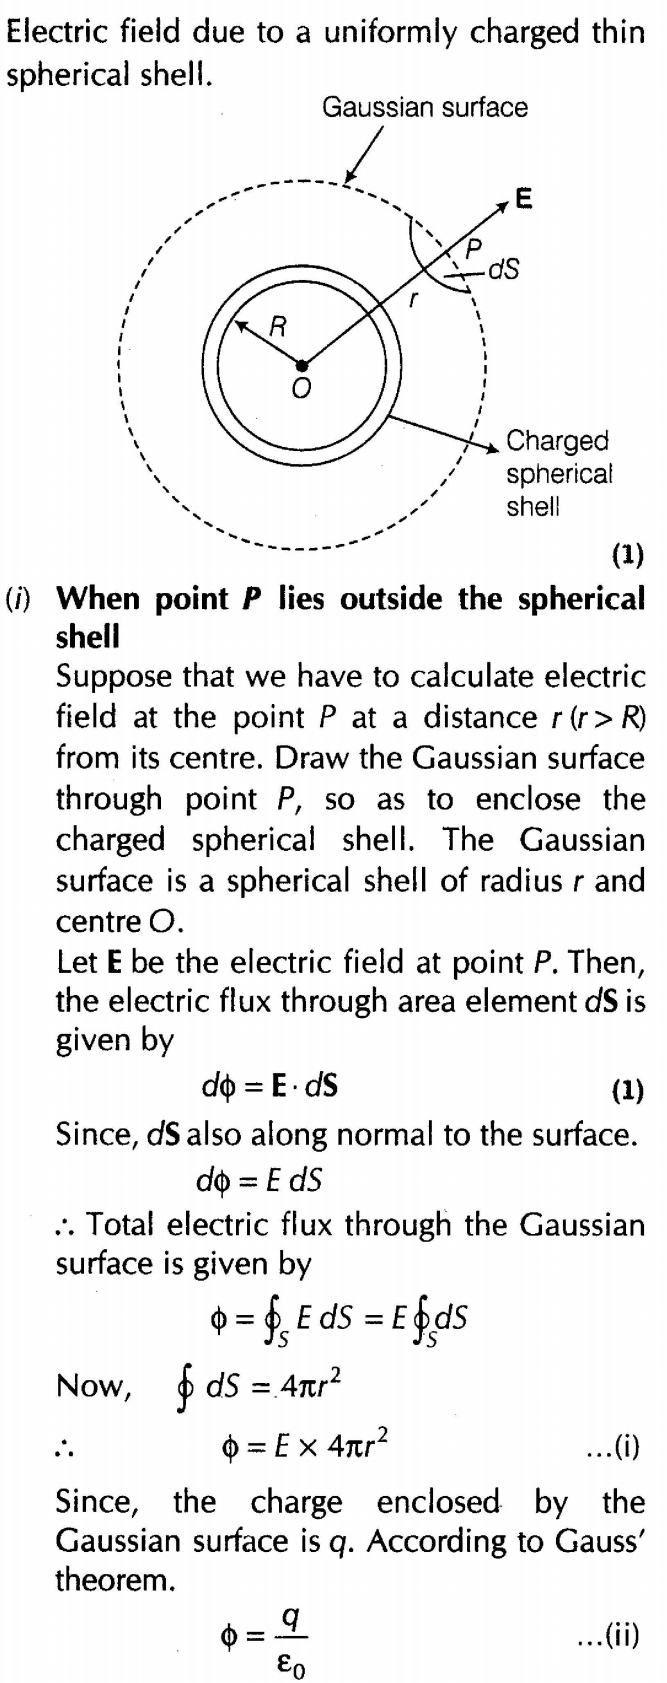 17 Best ideas about Gauss's Law on Pinterest | Physics ...